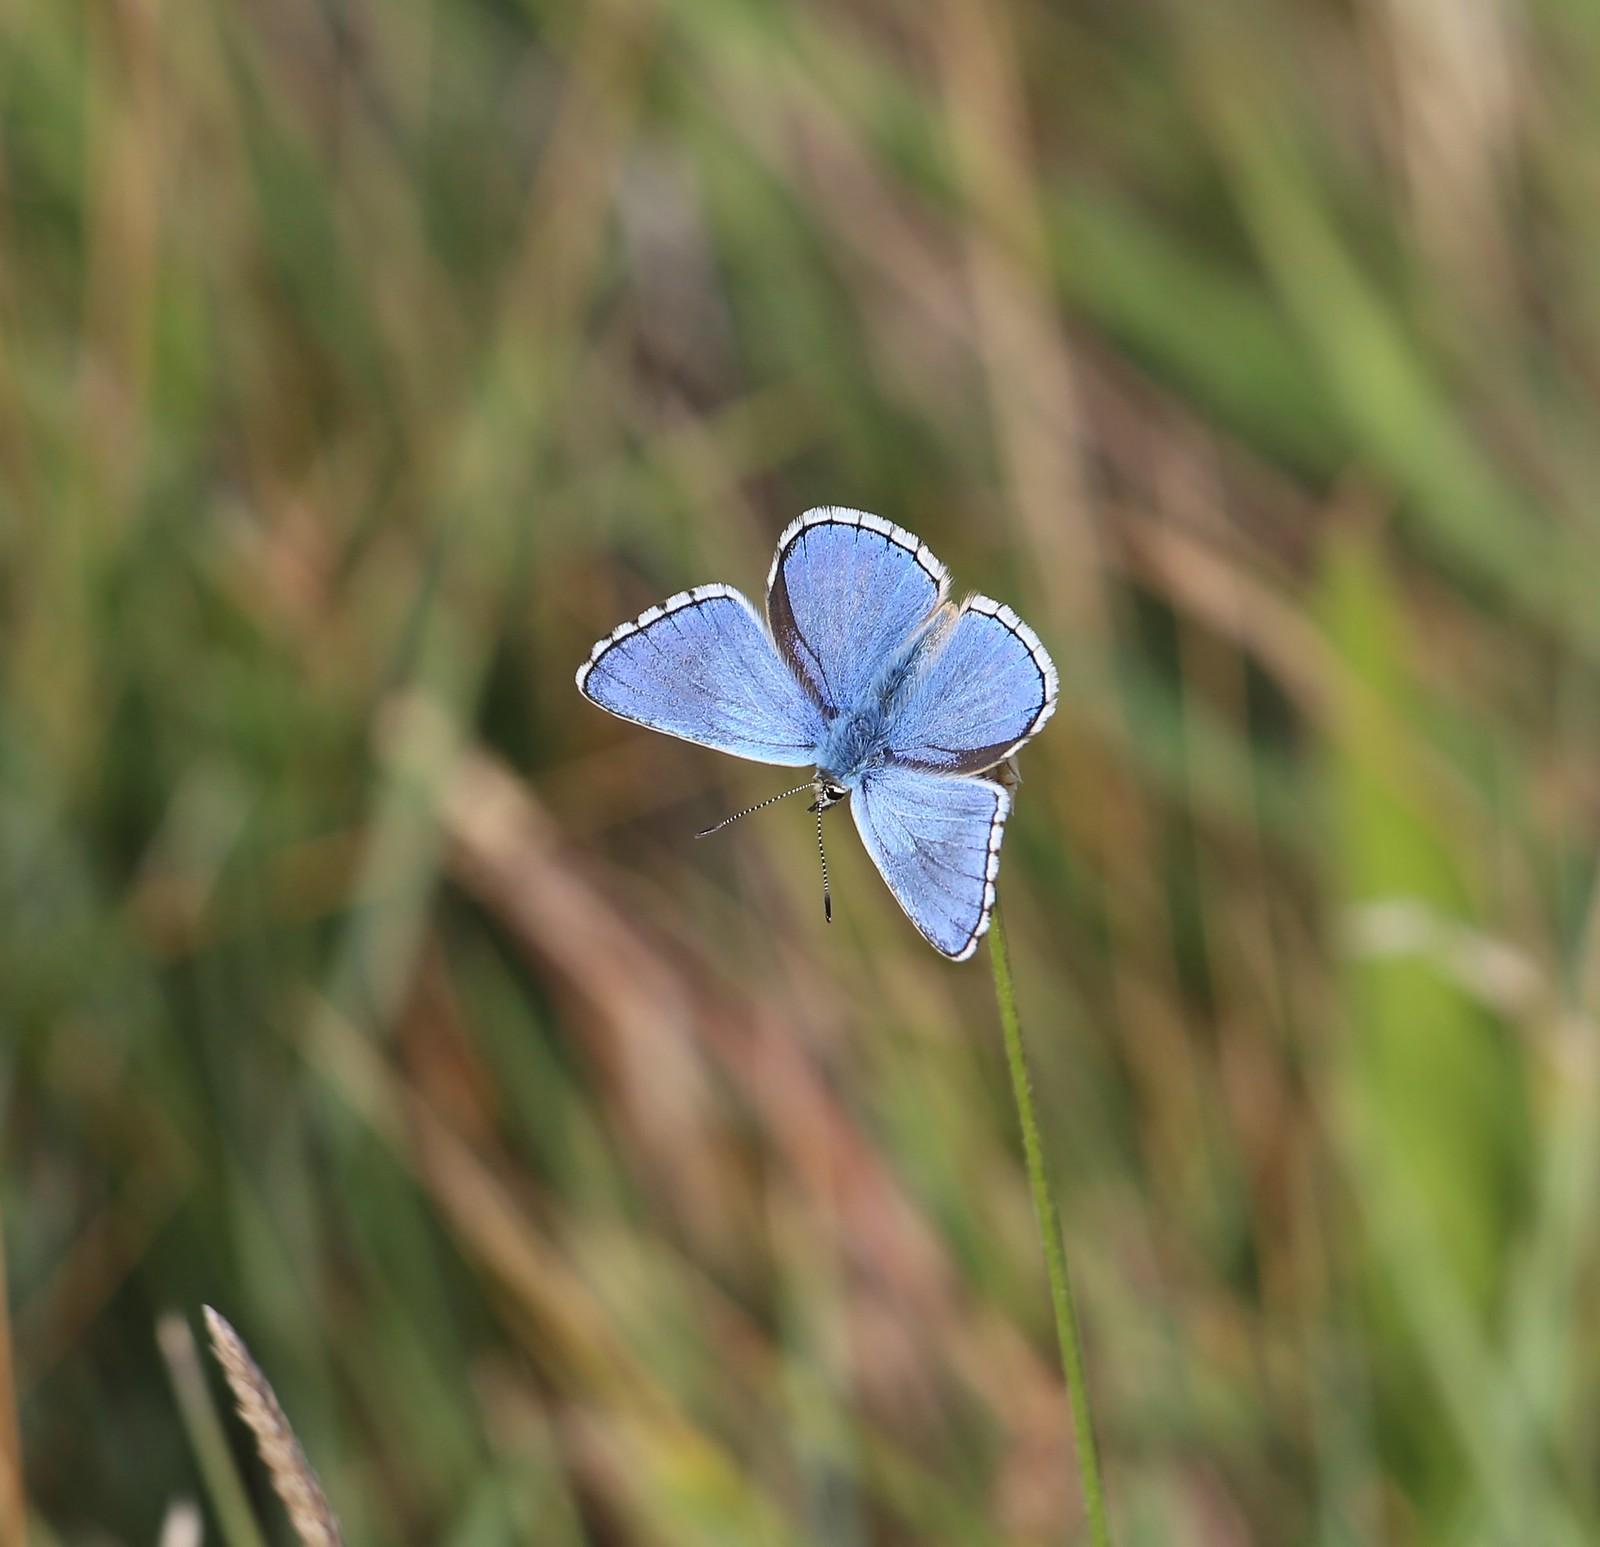 Adonis Blue - Cuckmere Haven